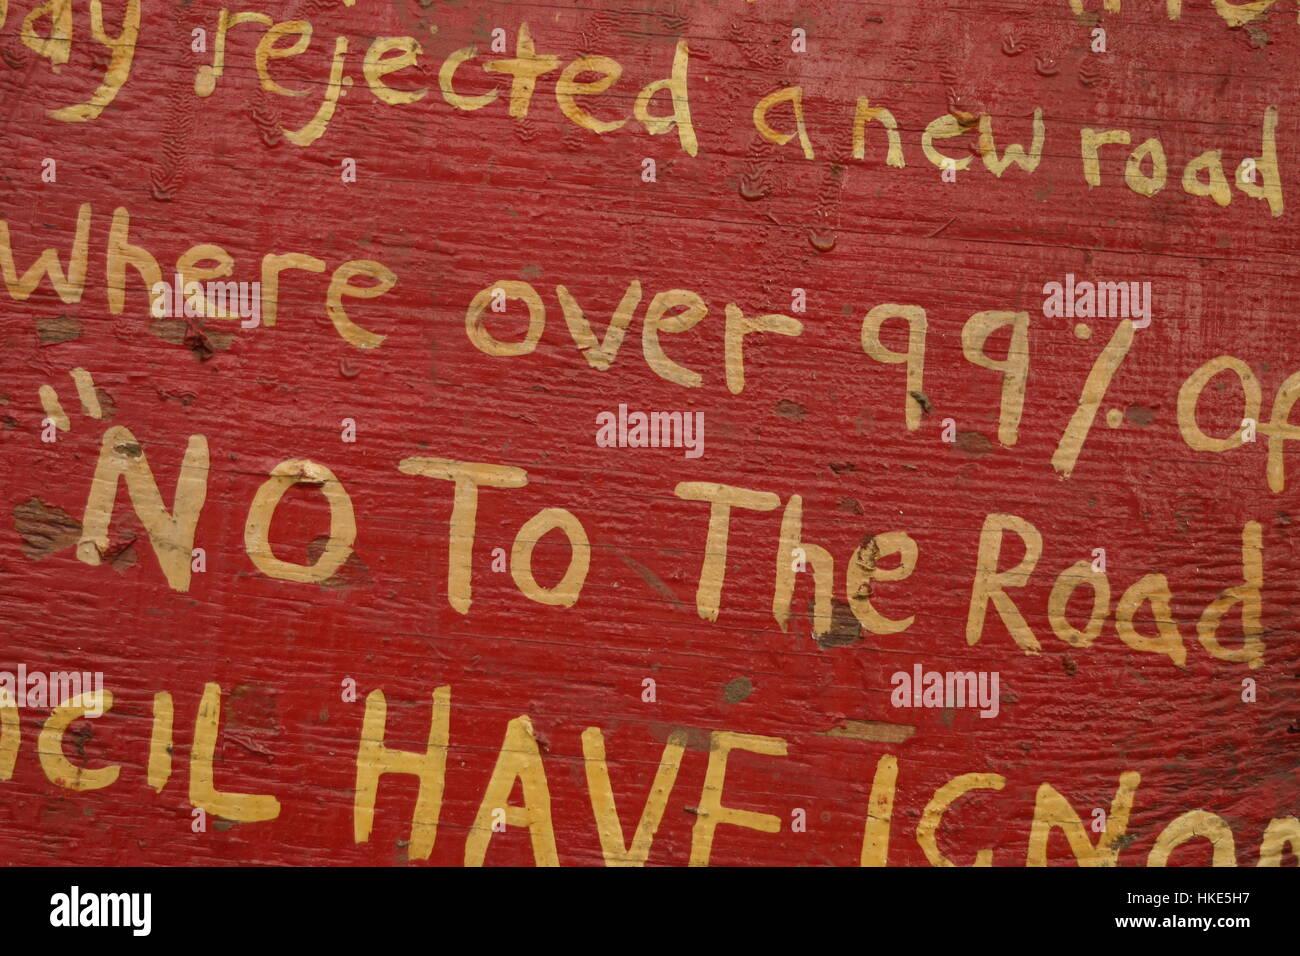 Signs at bilston Glen, Scotland, protest site - Stock Image